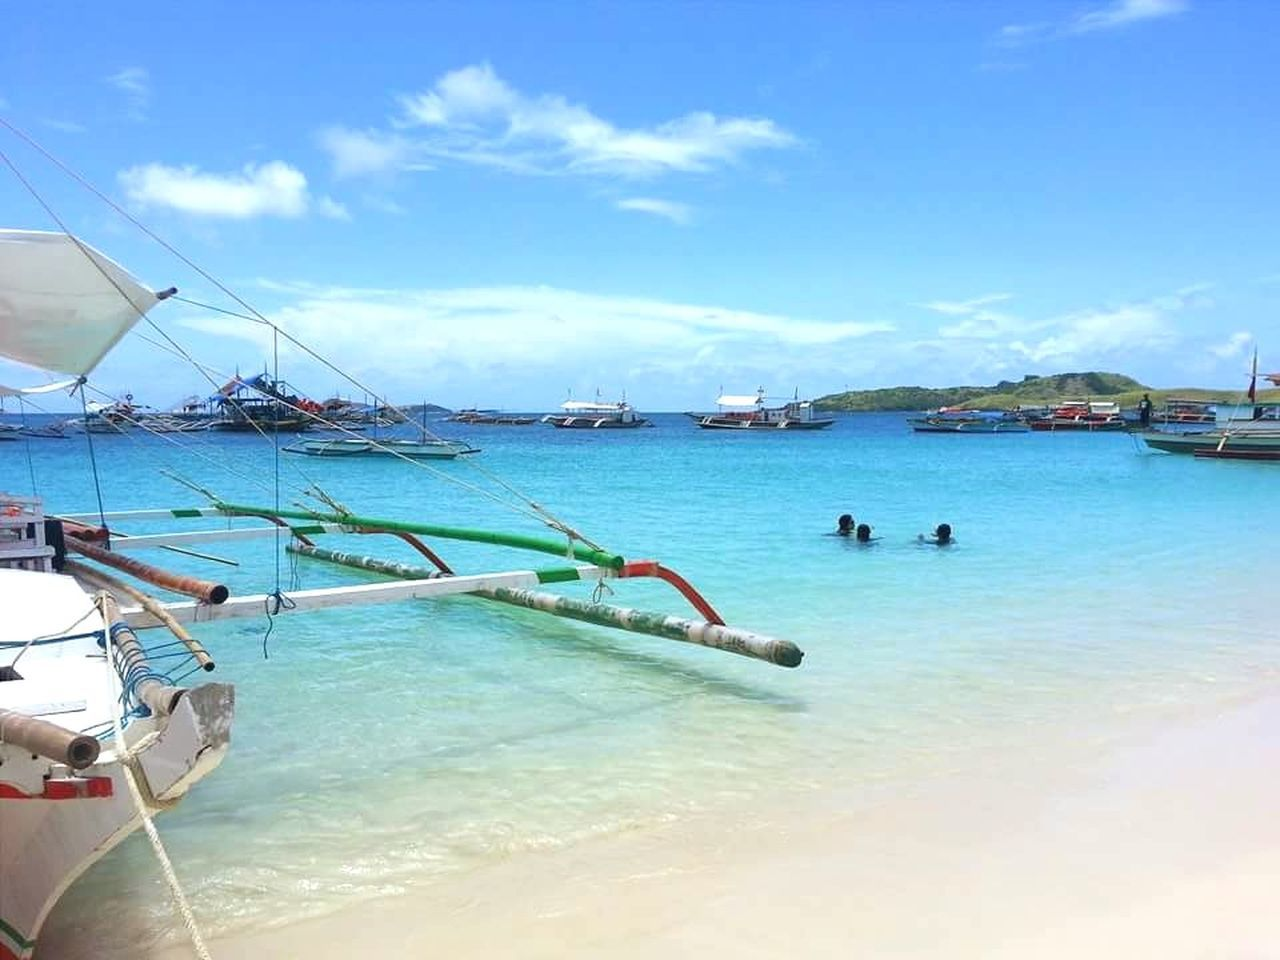 Caluguas Sea Beach Outdoors Nature Day Tranquility Scenics Beauty In Nature Cloud - Sky Philippines Calaguas Camarinesnorte EyeEmNewHere